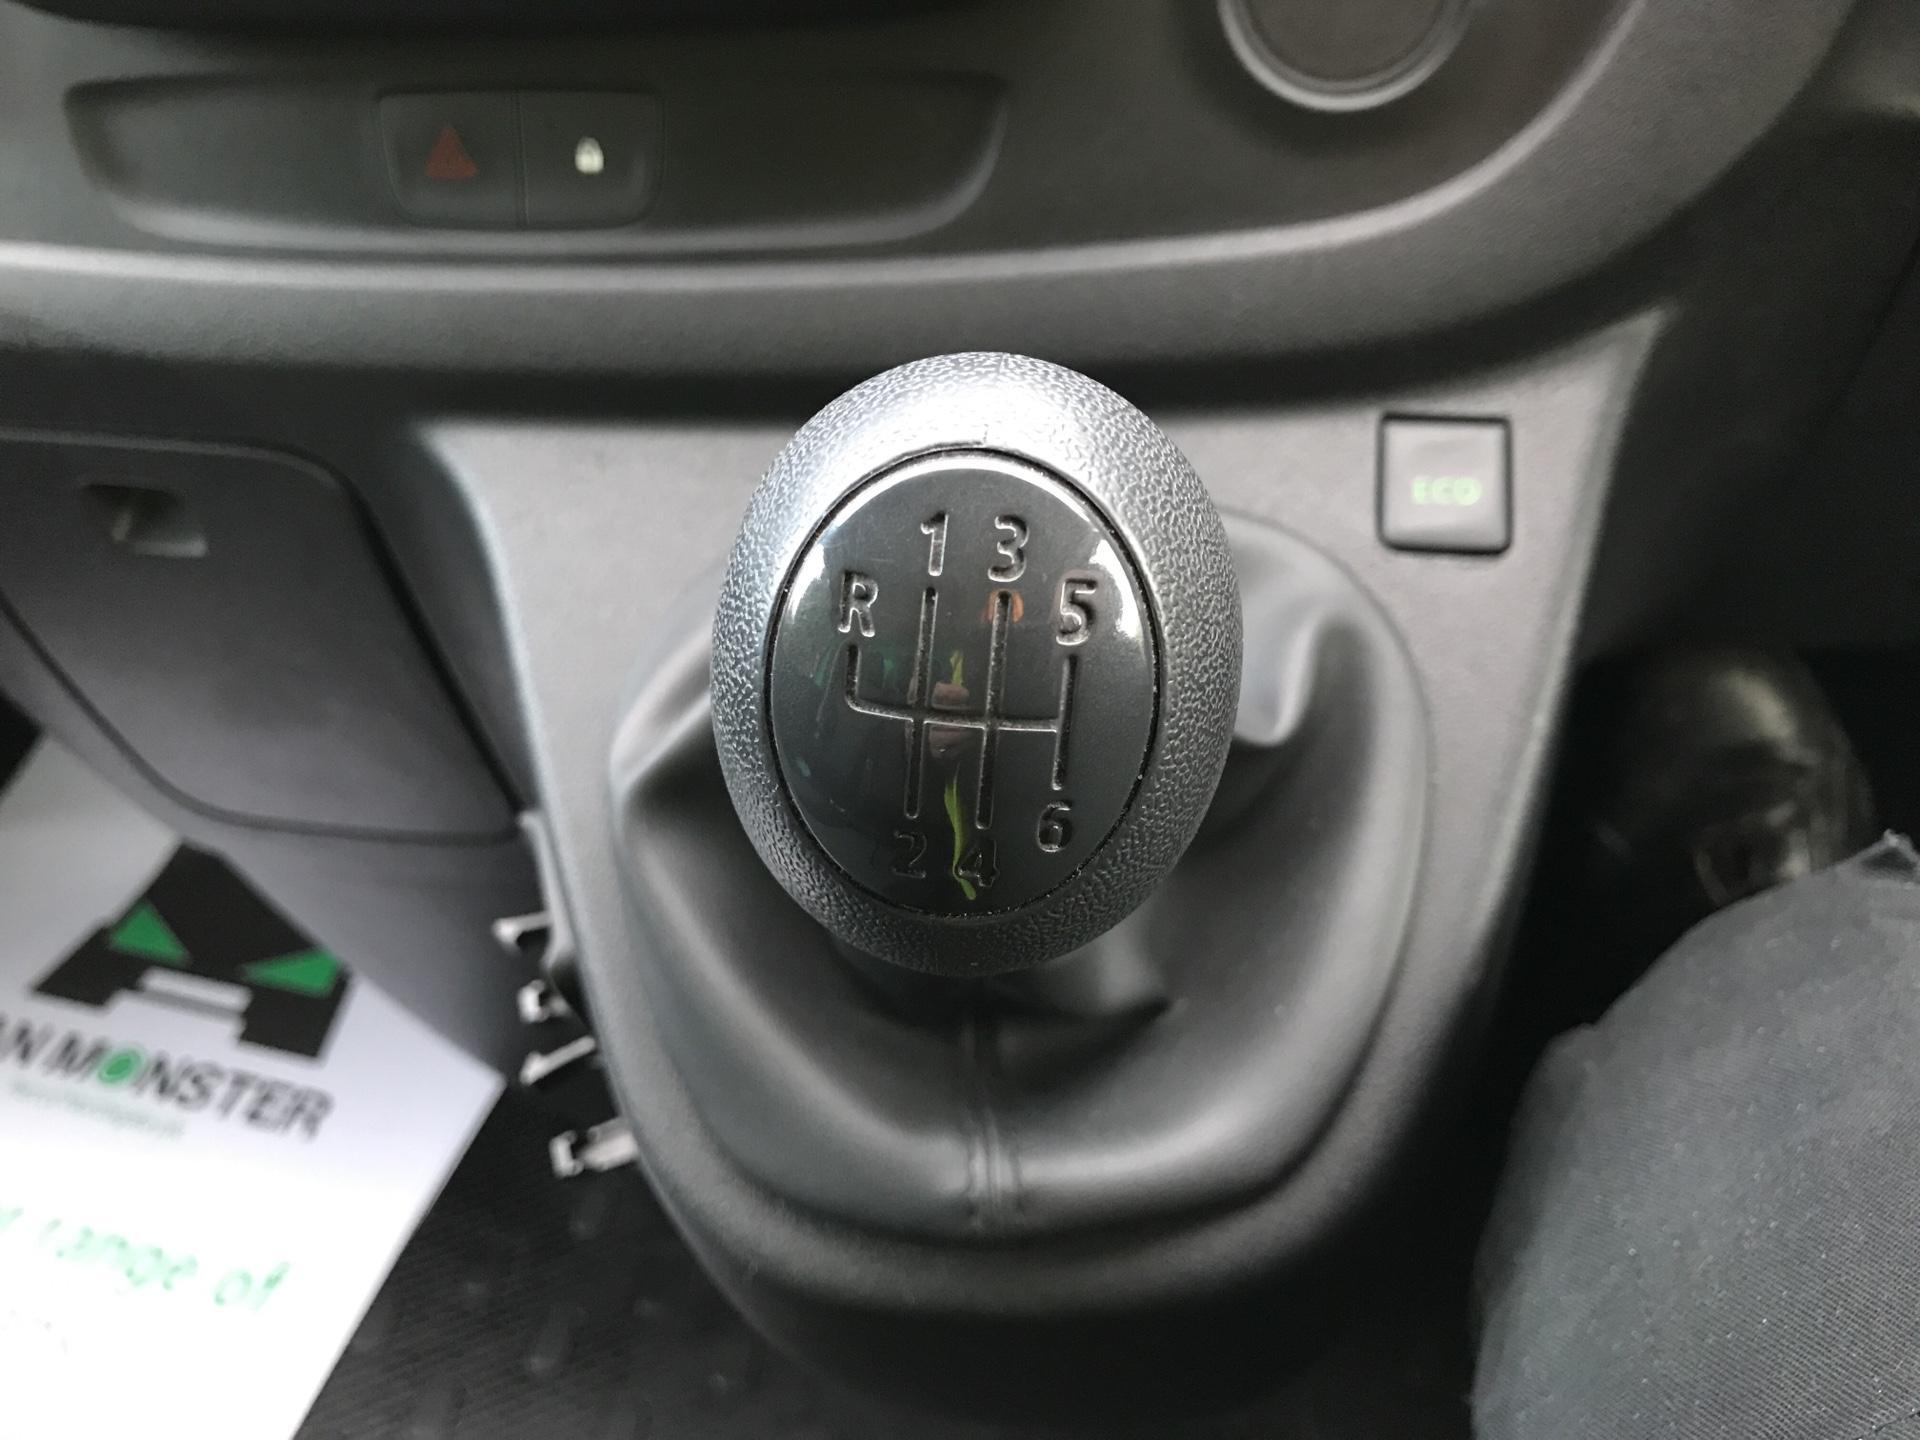 2017 Vauxhall Vivaro L2 H1 2900 1.6 CDTI 95PS EURO 6 (VALUE RANGE VEHICLE - CONDITION REFLECTED IN PRICE) (BK17OJZ) Image 11